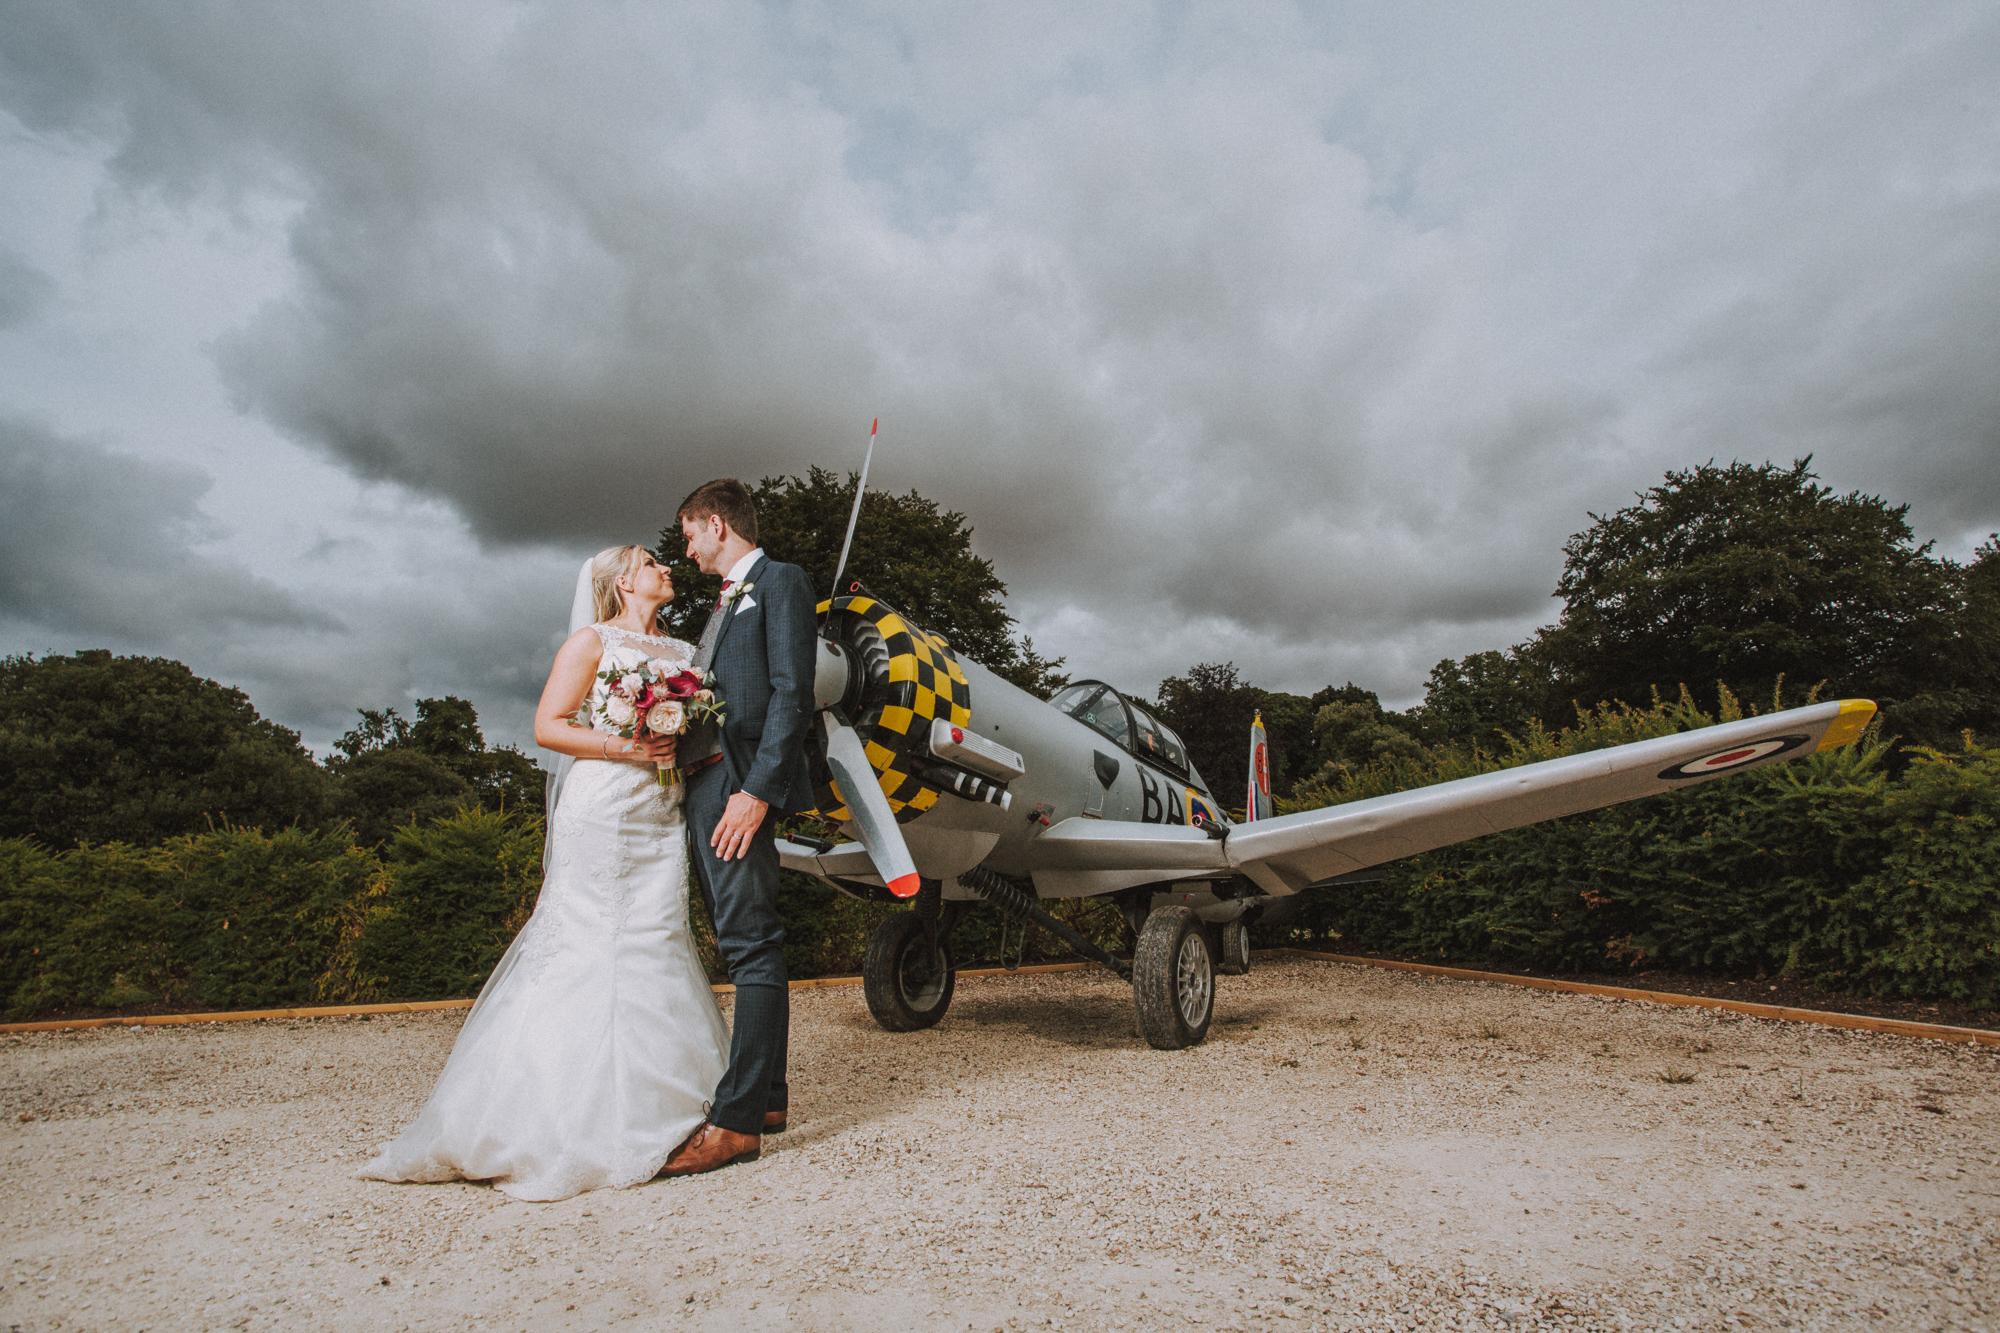 bowcliffe hall wedding photographers yorkshire-66.jpg